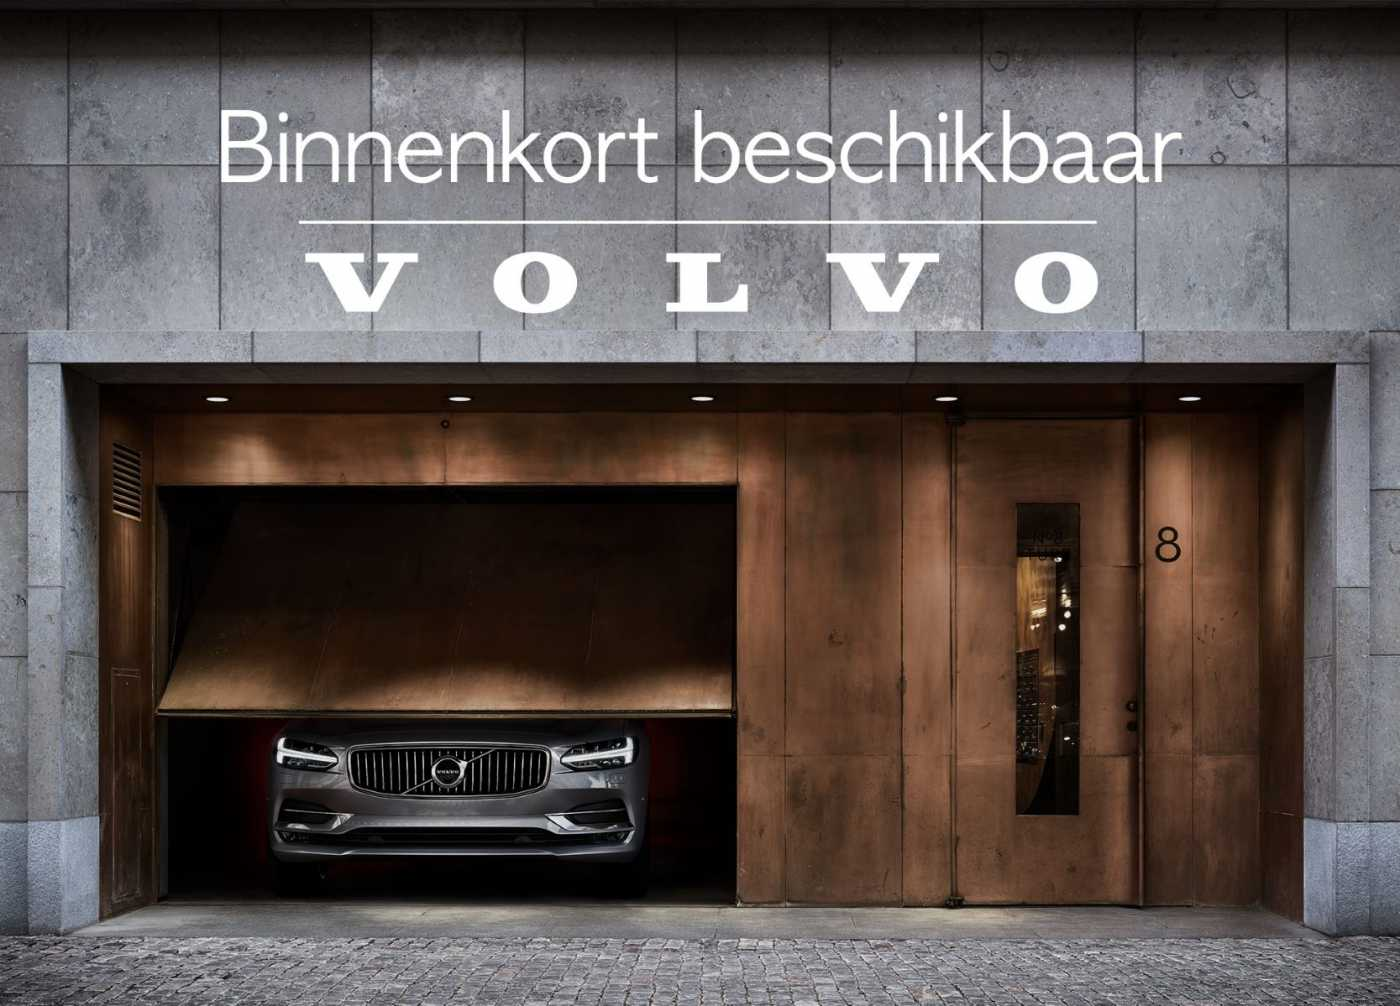 Volvo S60 Inscription T8 Twin Engine eAWD plug-in hybride 1/2